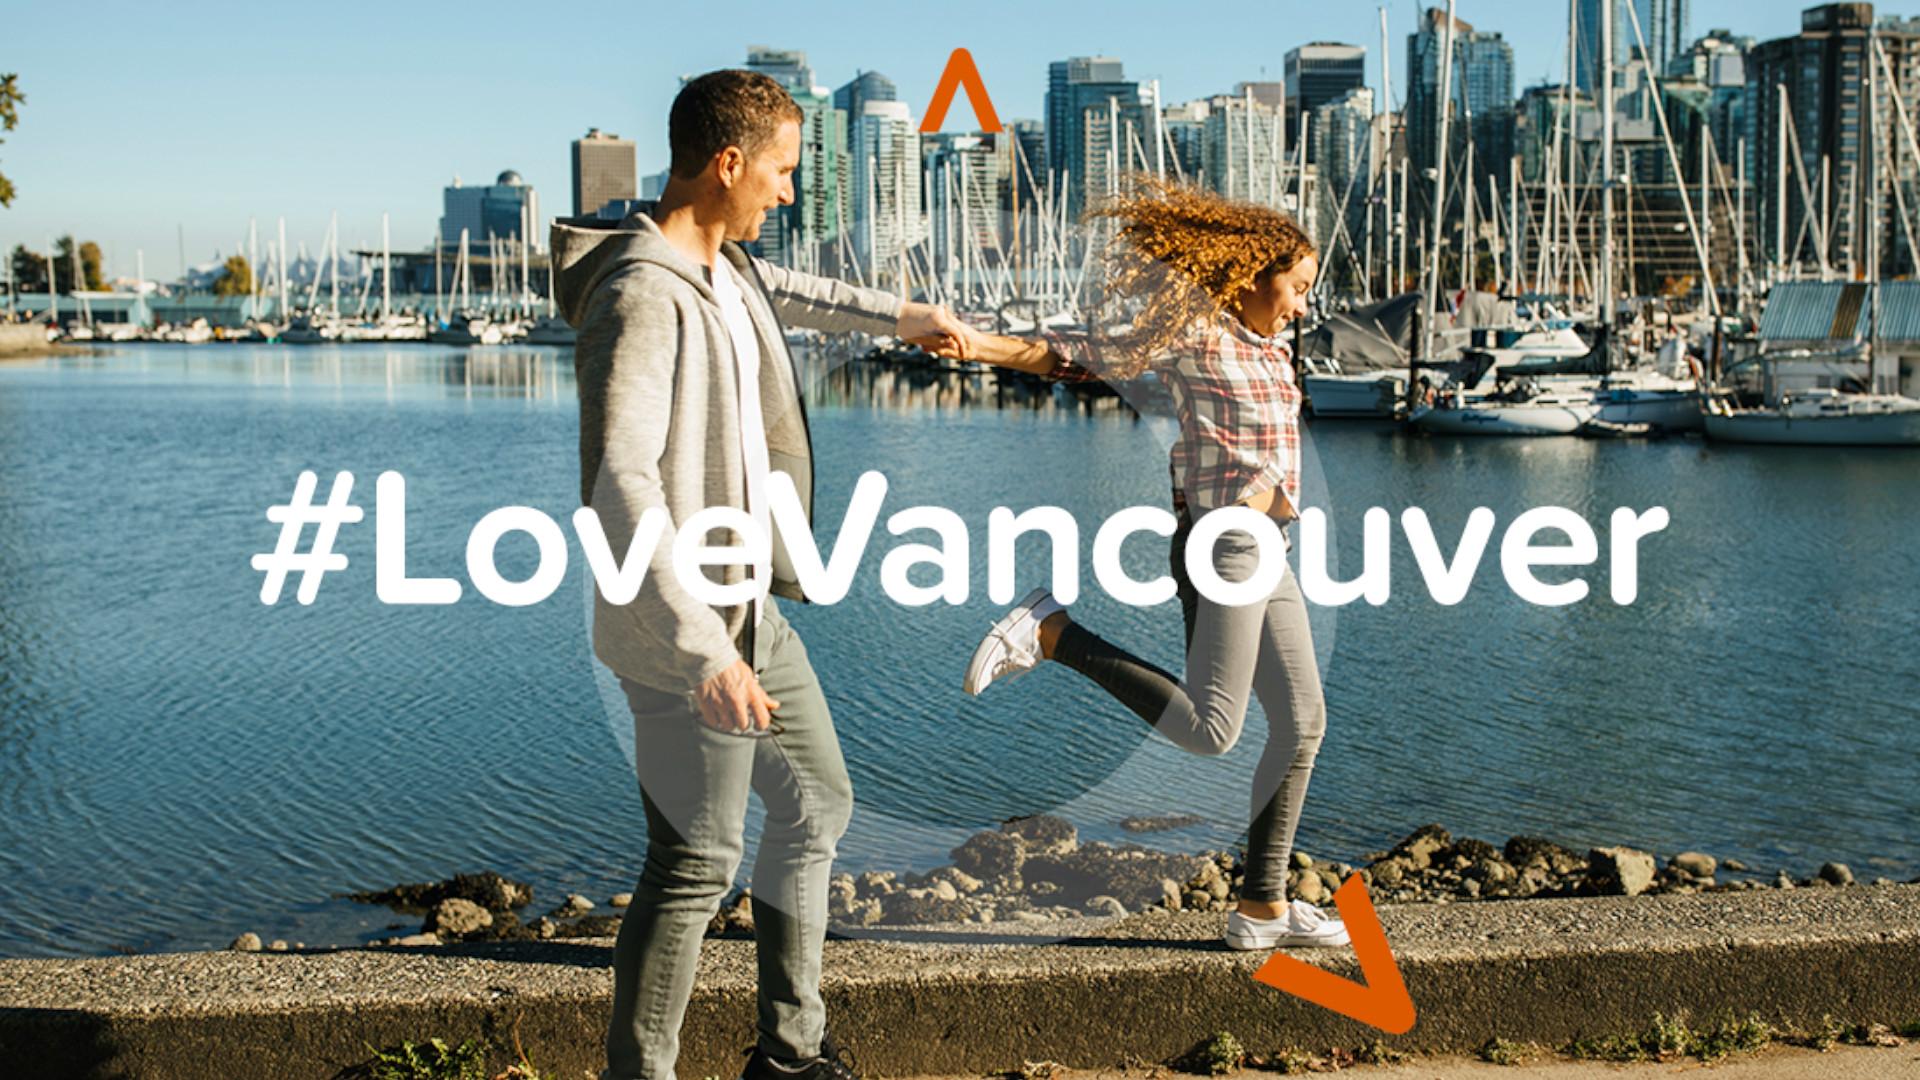 #LoveVancouver, Tourism Vancouver Campaign, Canada